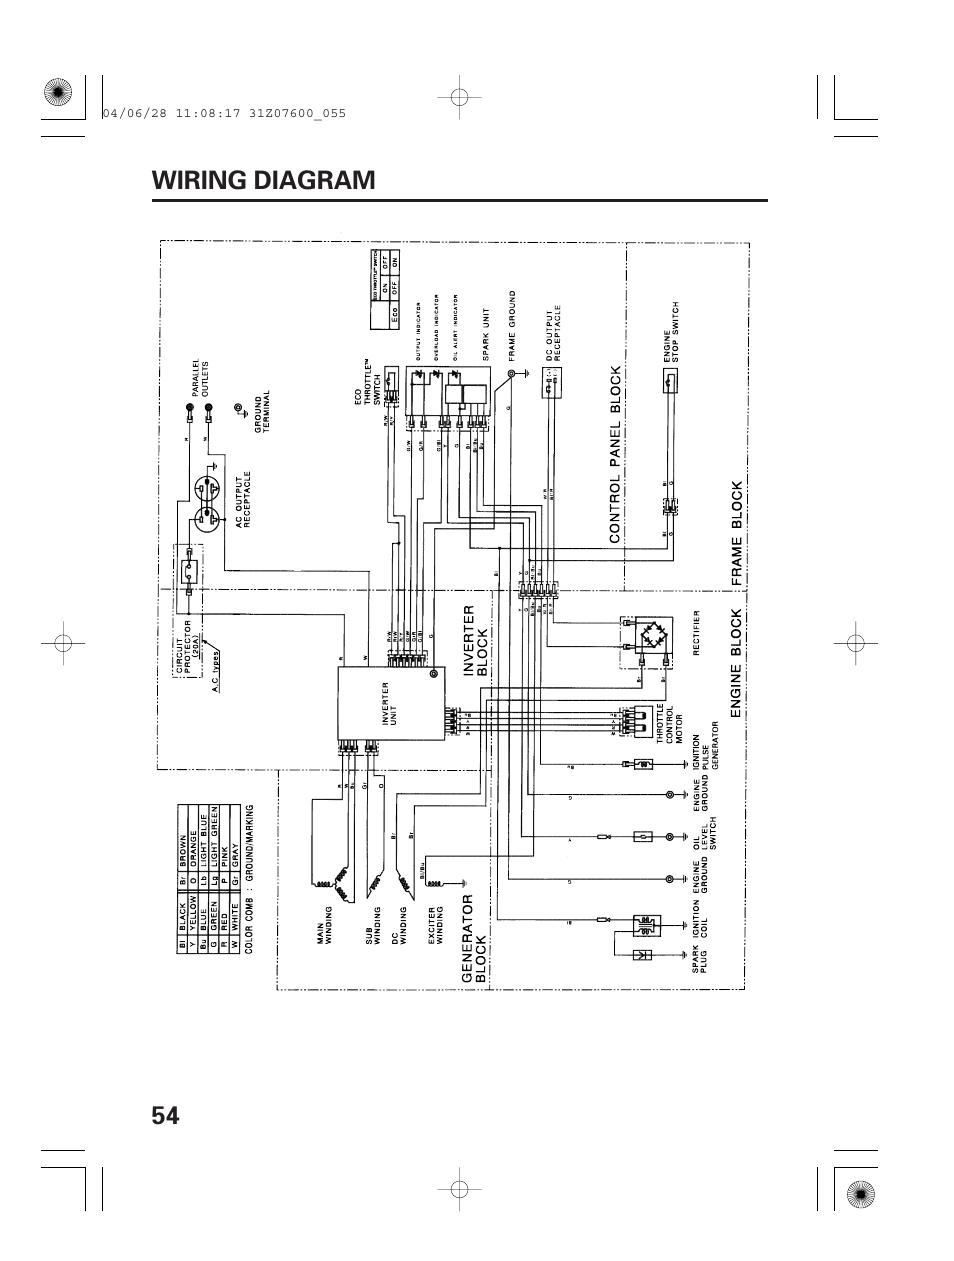 honda eu2000i wiring diagram wiring diagram a7 coleman powermate 5000 wiring diagram honda eu2000i an1 honda generator